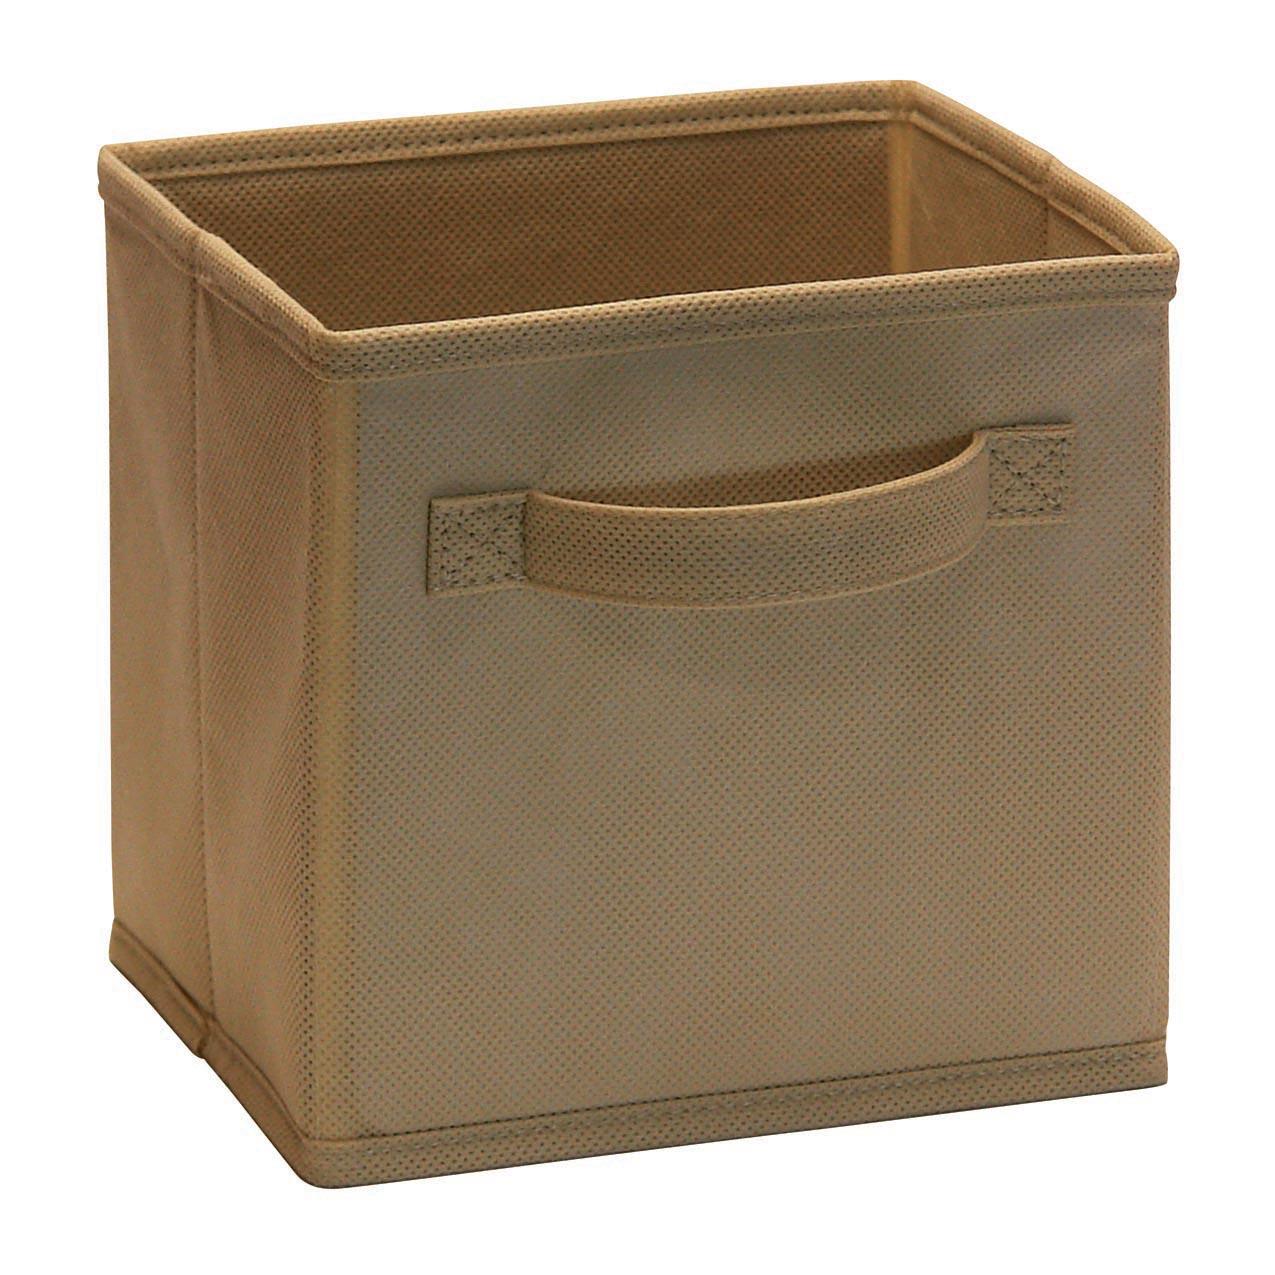 Home Fabric Storage Bins Fabric Storage Fabric Drawers